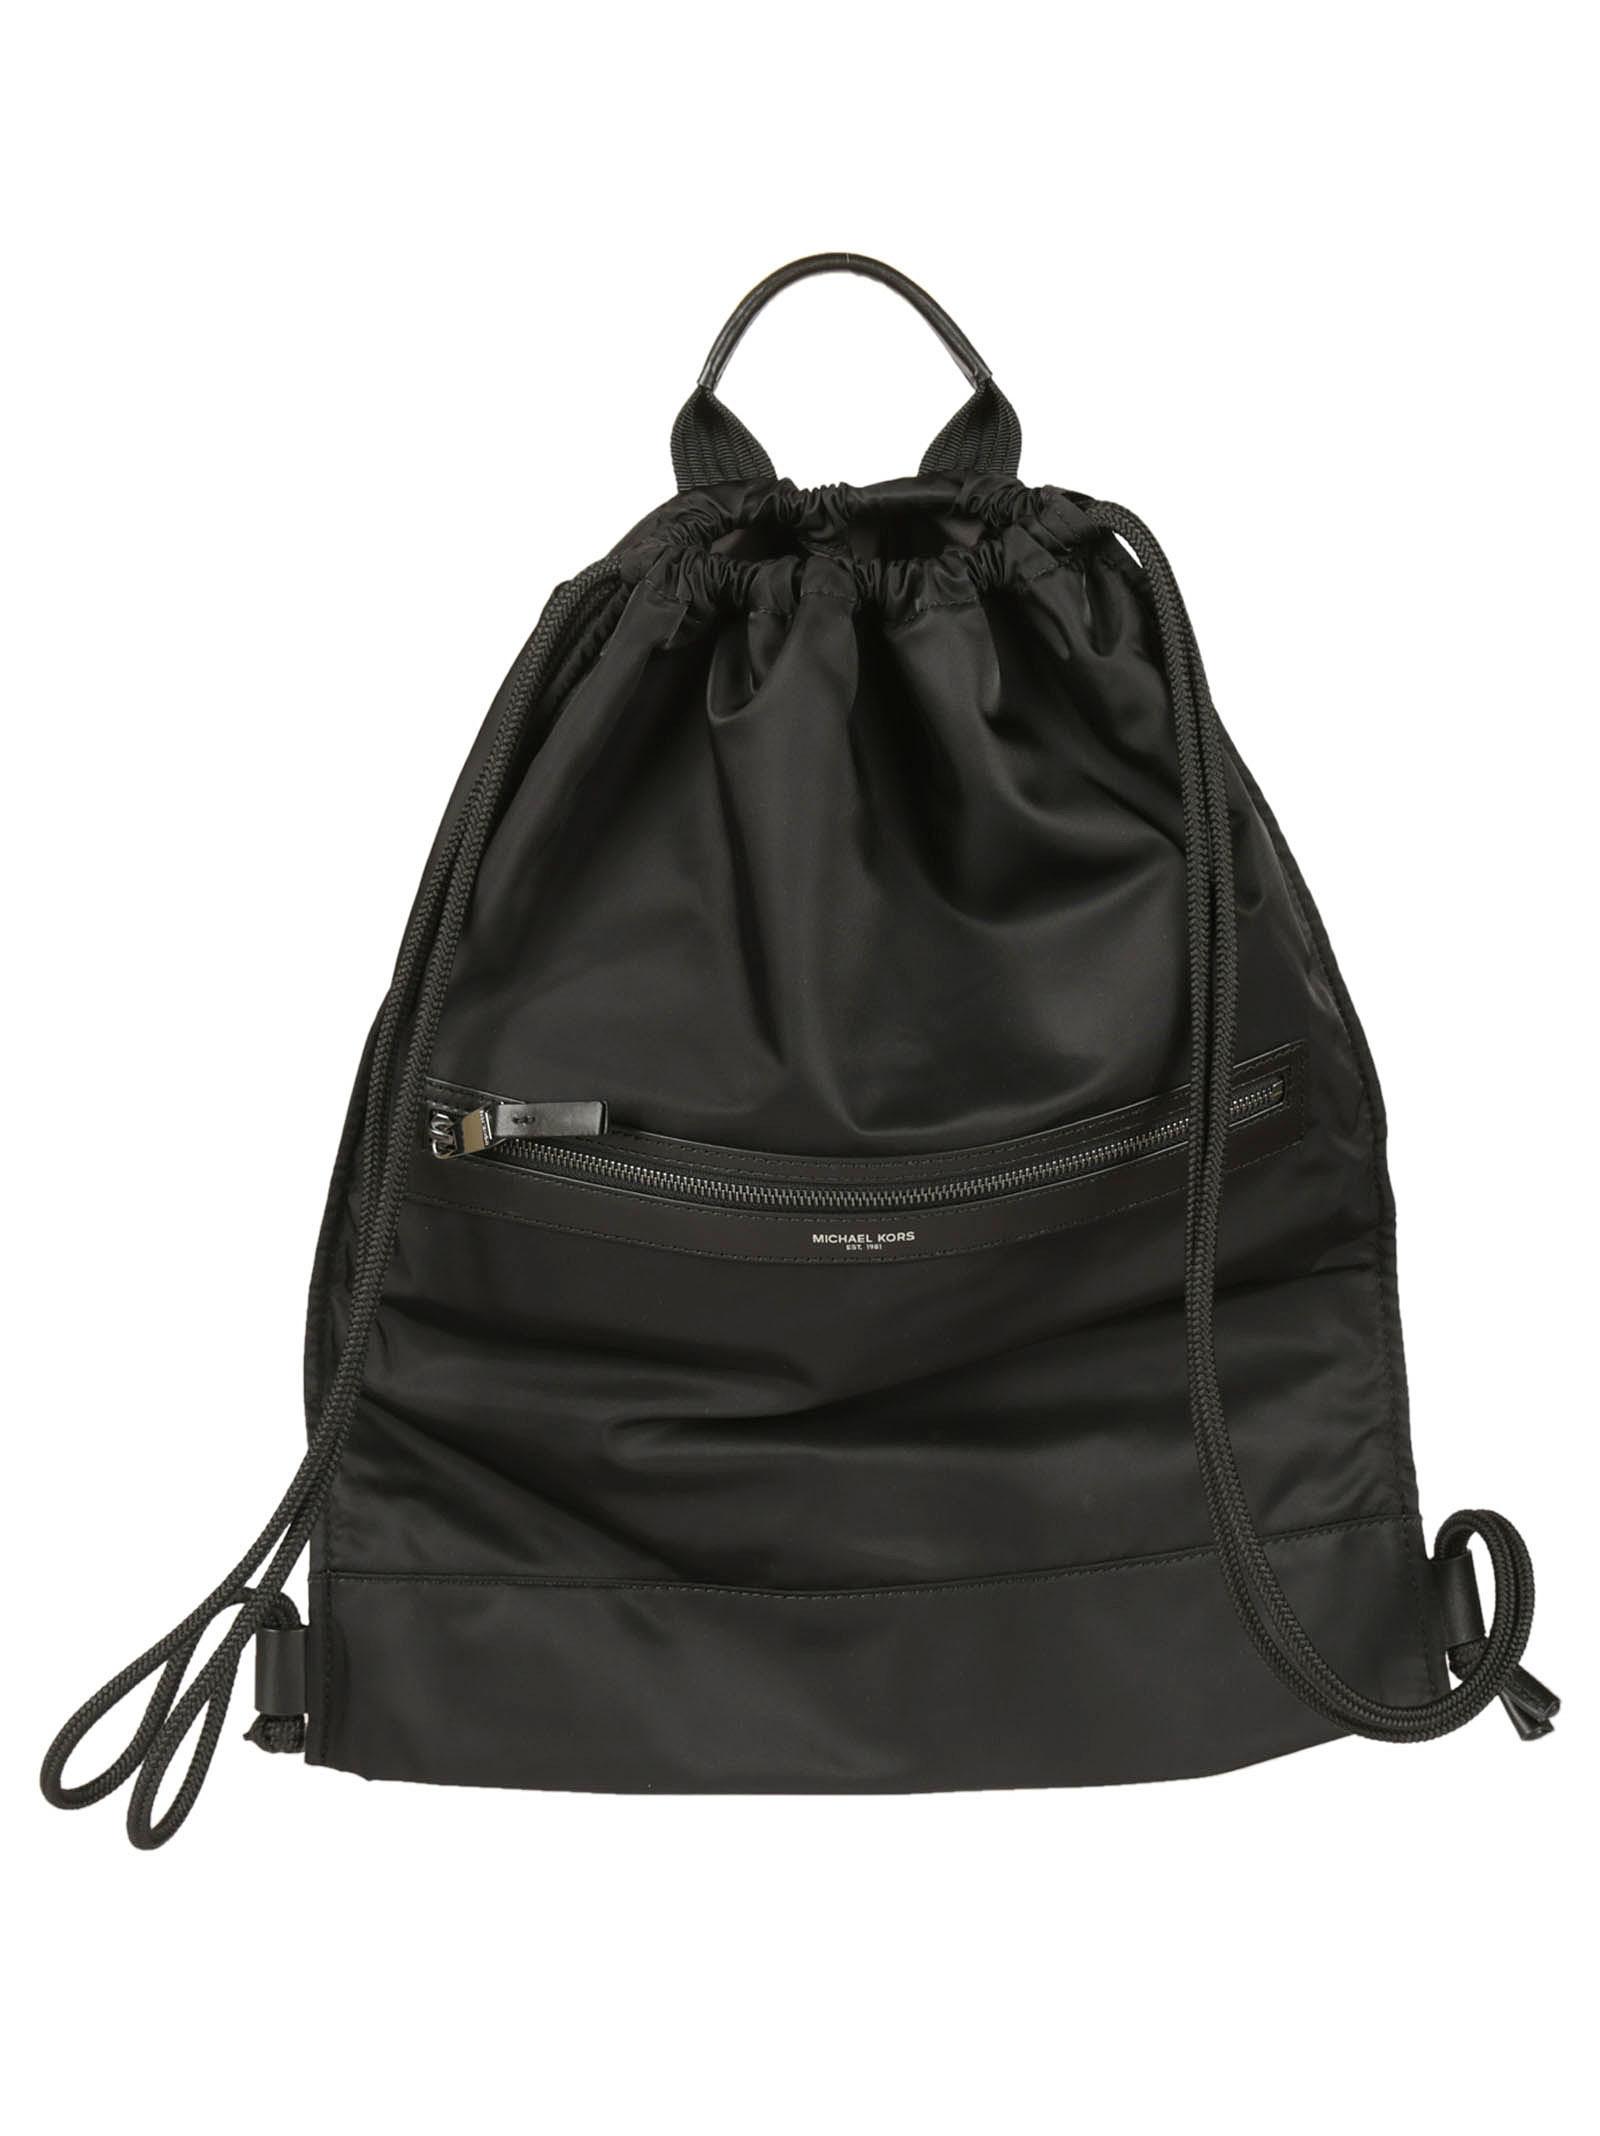 michael kors male michael kors drawstring backpack